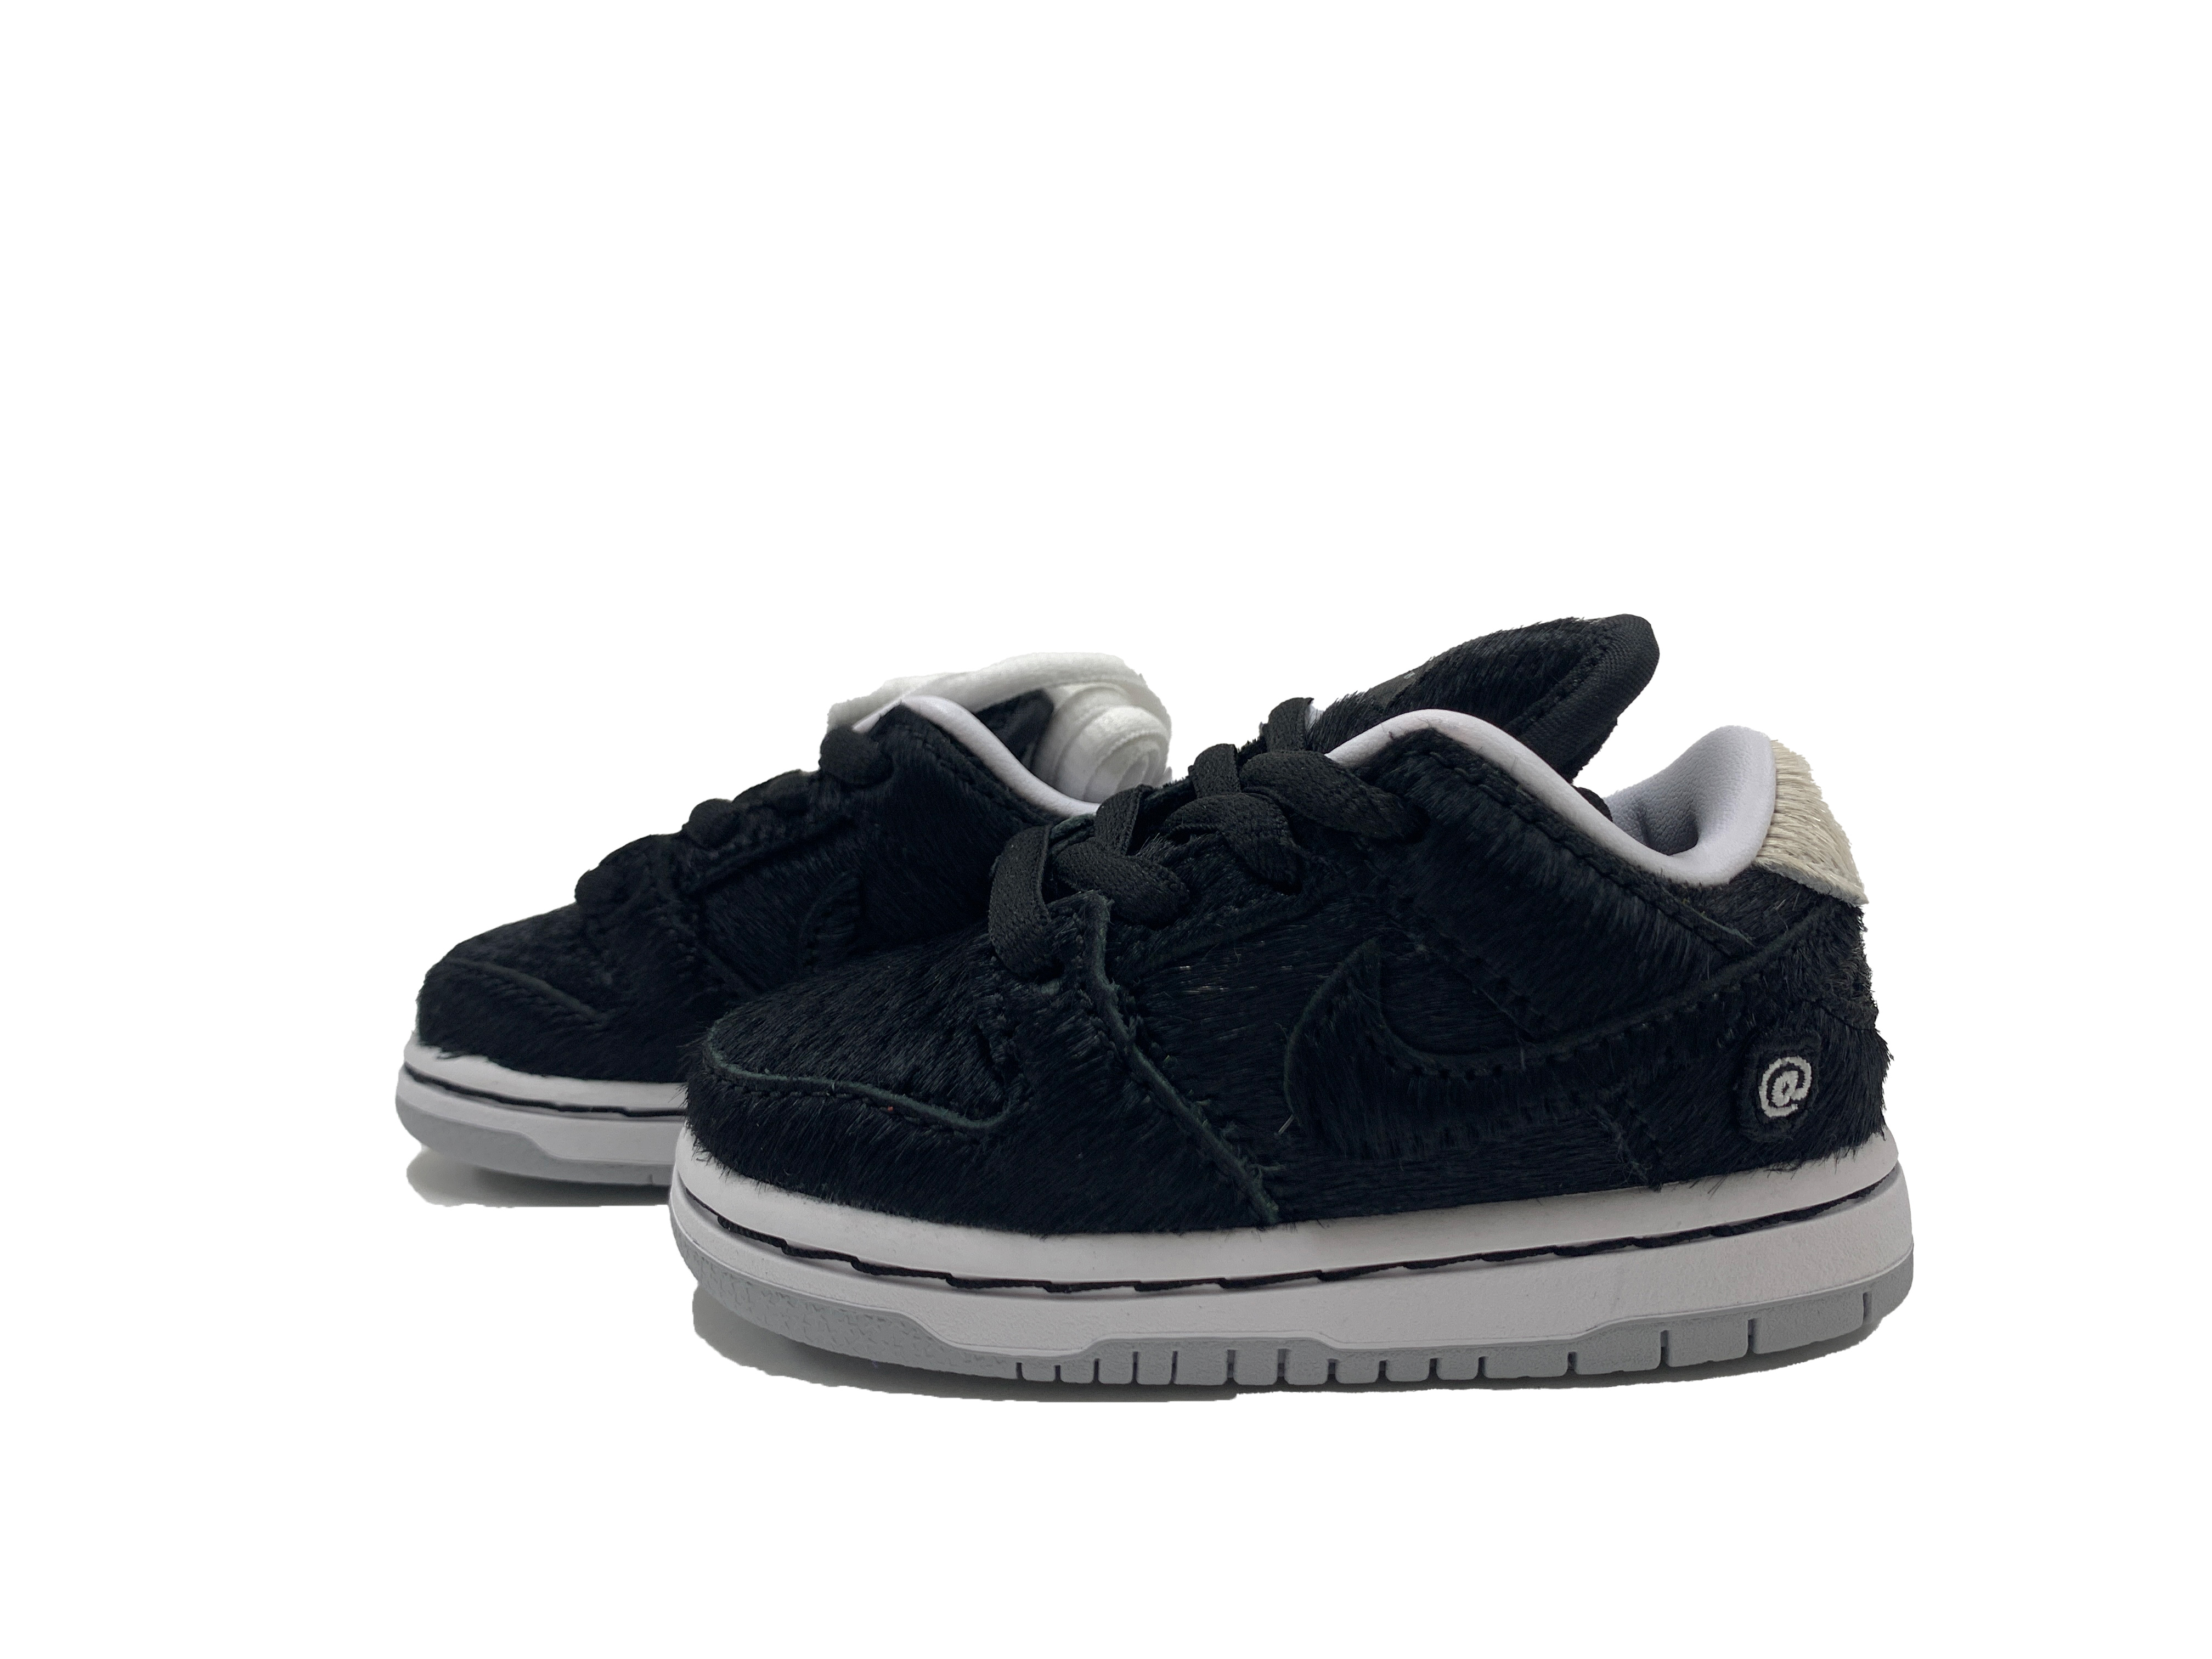 "Medicom Toy × Nike SB Dunk Low ""BE@RBRICK"" (メディコム トイ × ナイキ SB ダンク ロー ""ベアブック"") CZ5127-001 kids td"